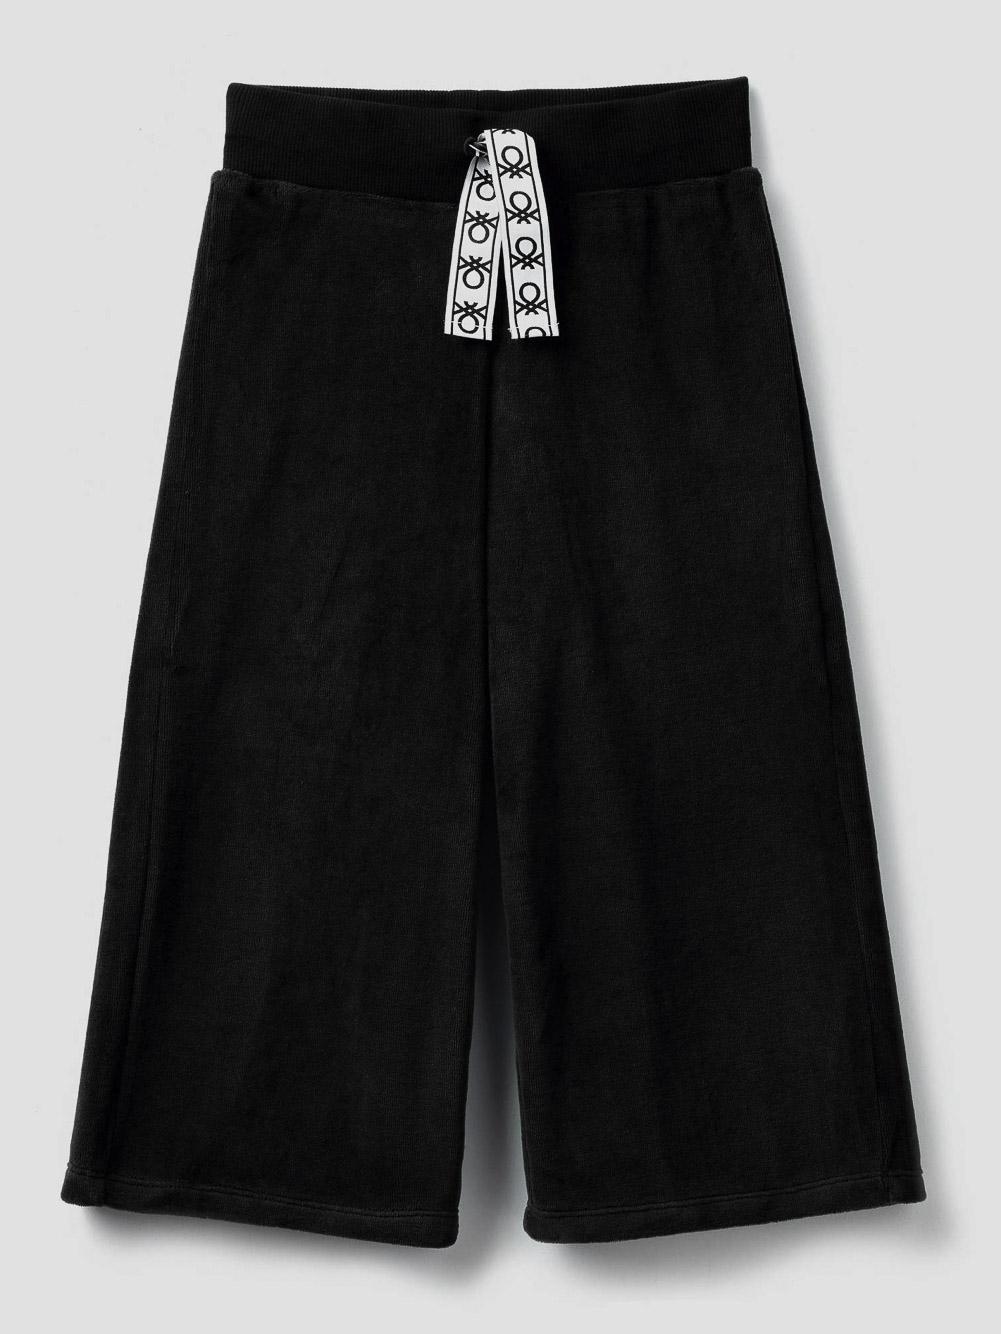 012 BENETTON Παντελόνι 3/4 από σενίλ 3UK0I0100 20A100